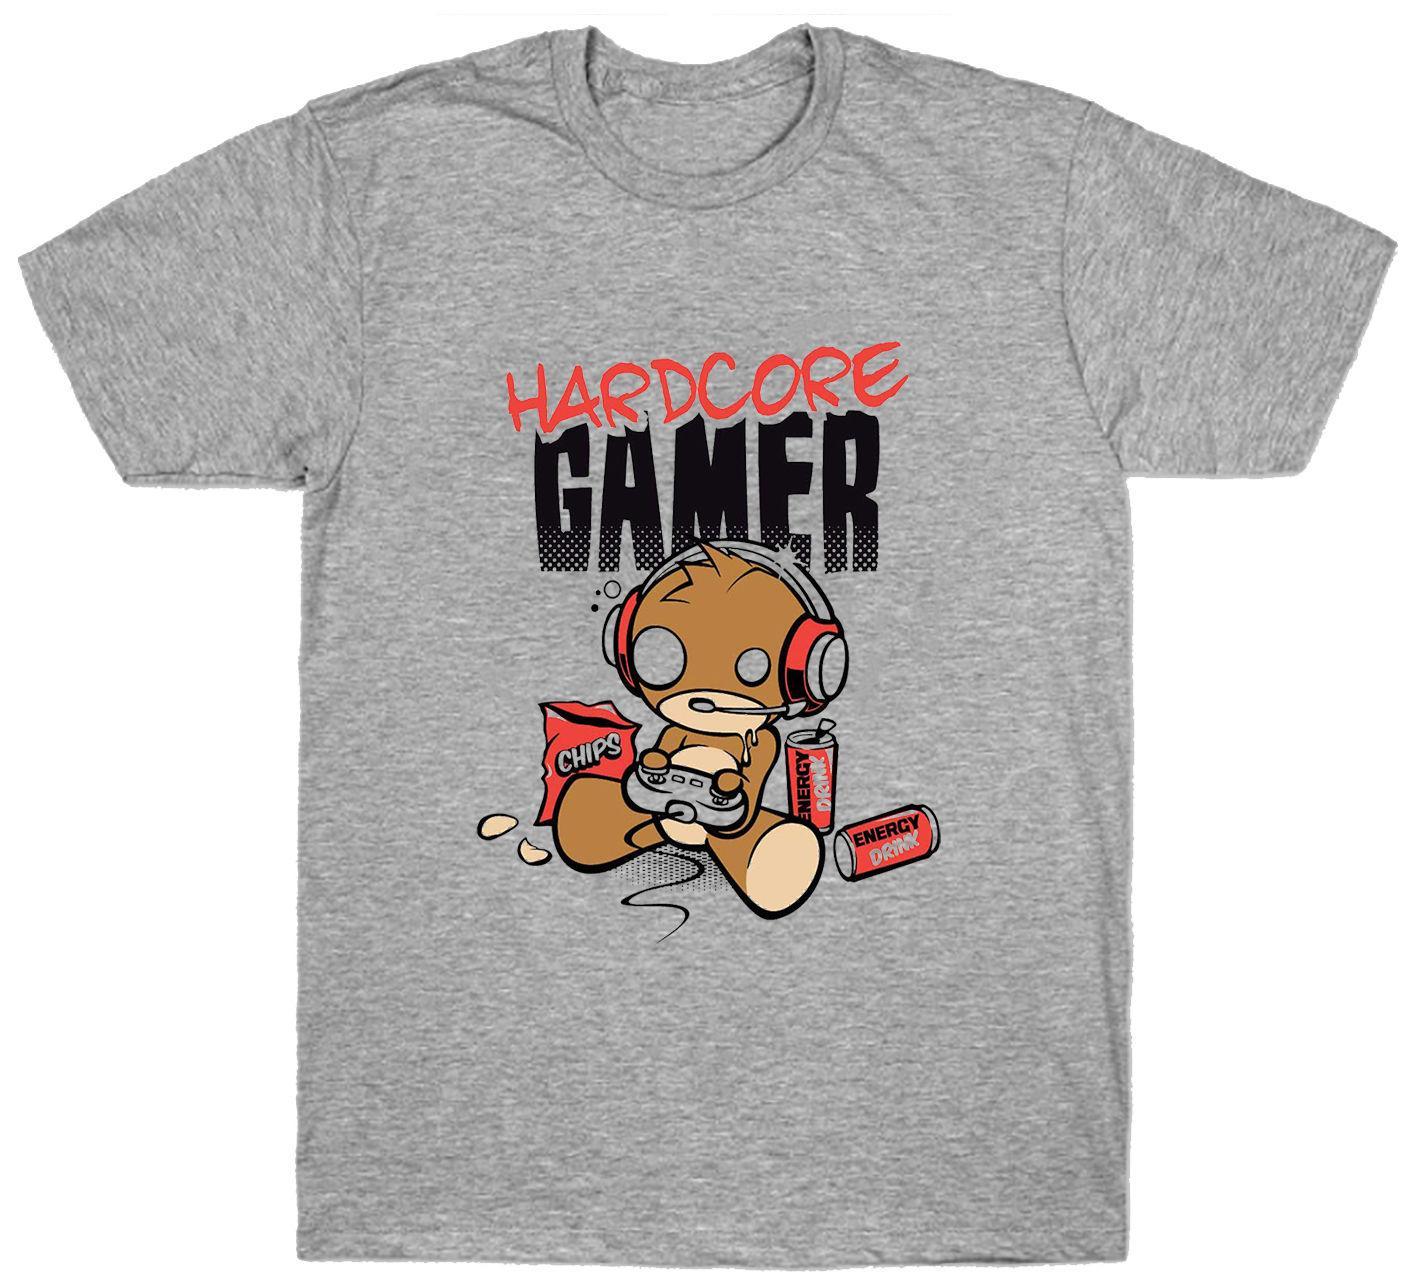 Computer Xbox Acquista Game Gamer Hardcore T Shirt Playstation wZkiuTOPX